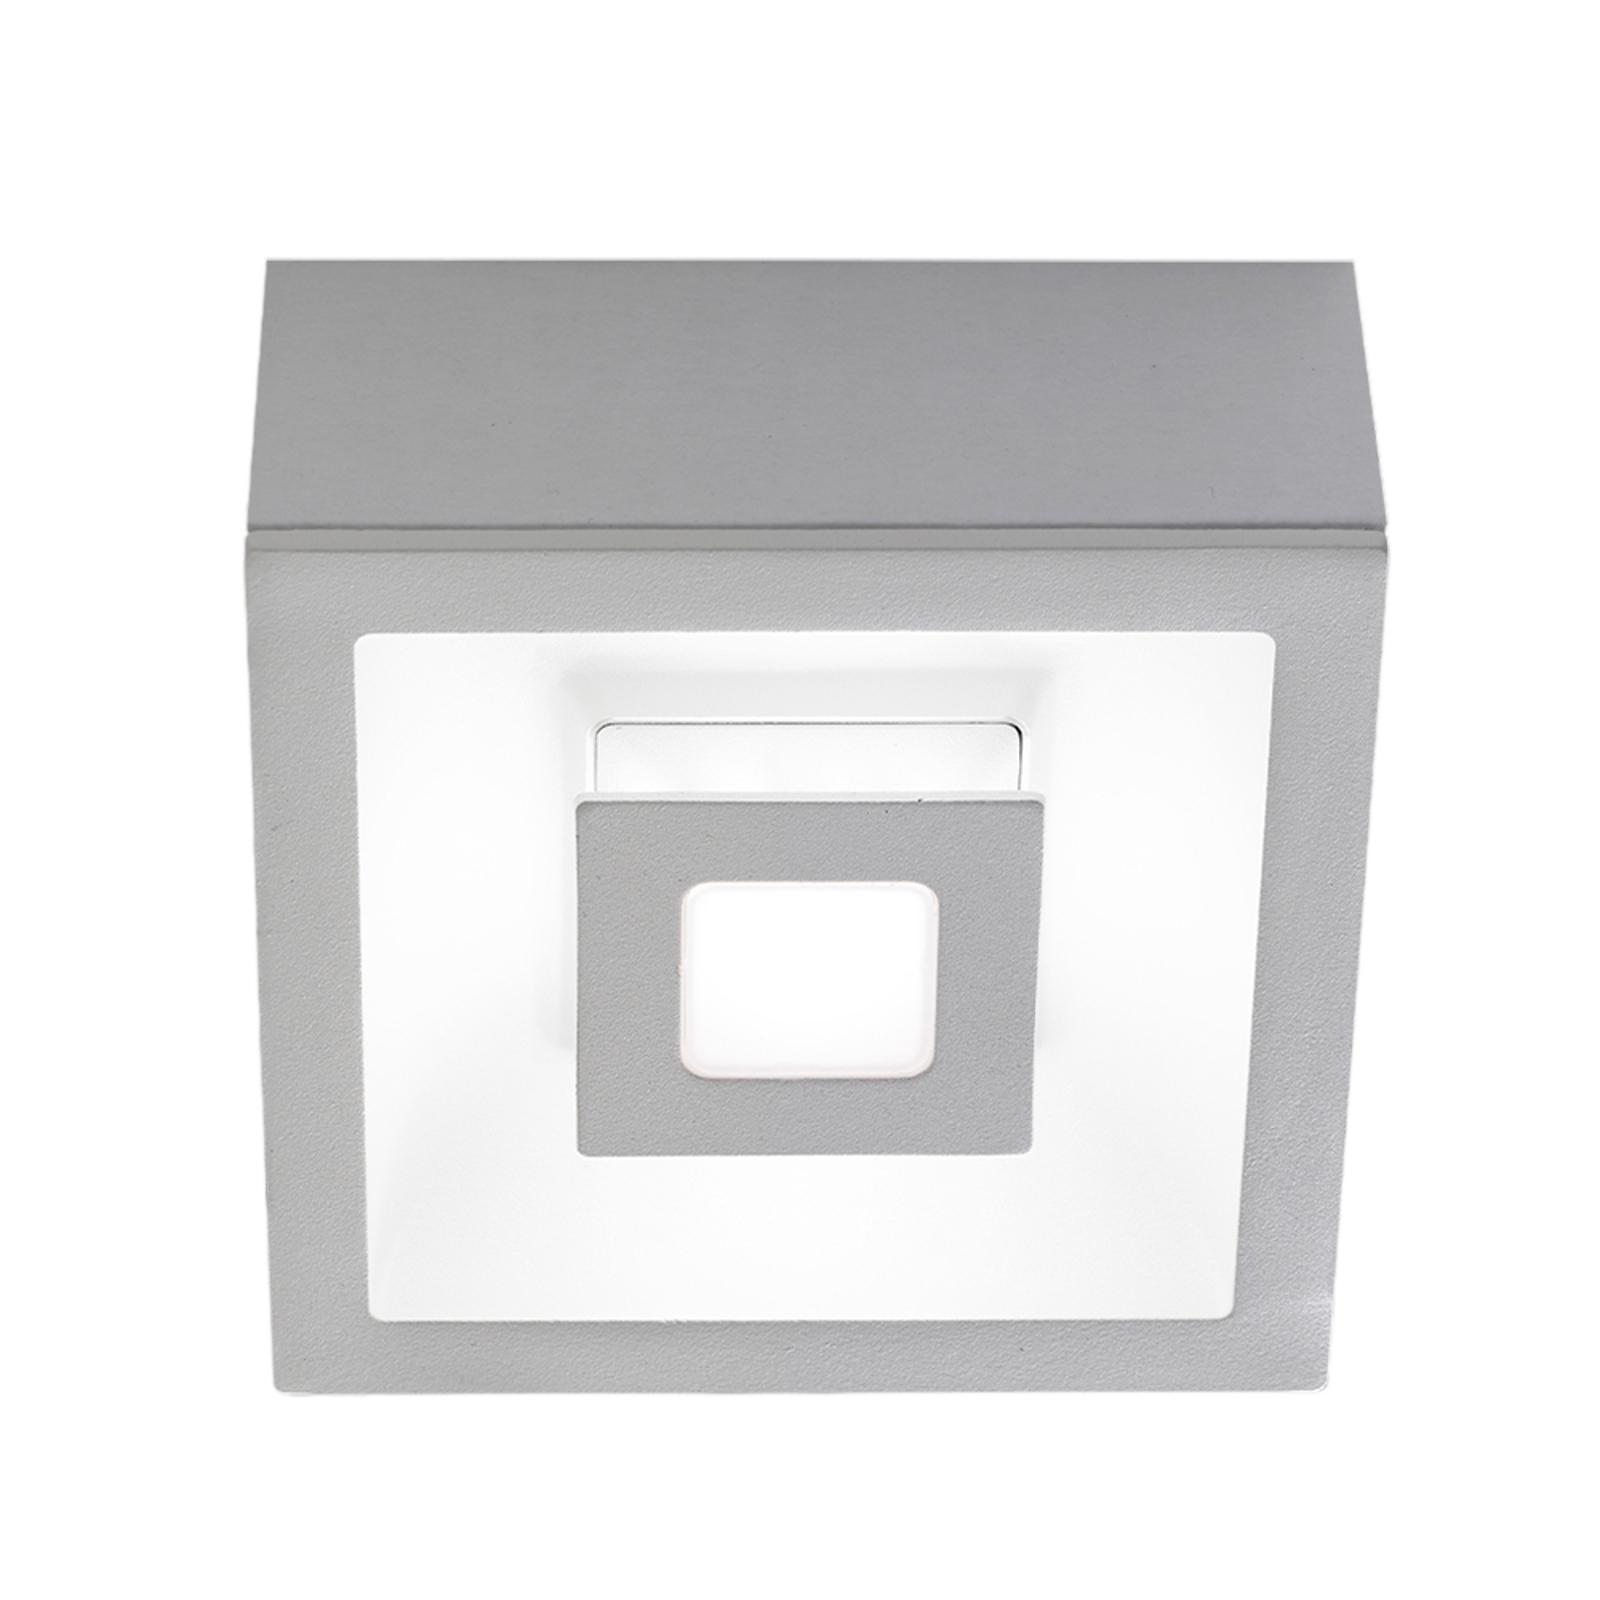 Plafonnier LED Eclipse angulaire